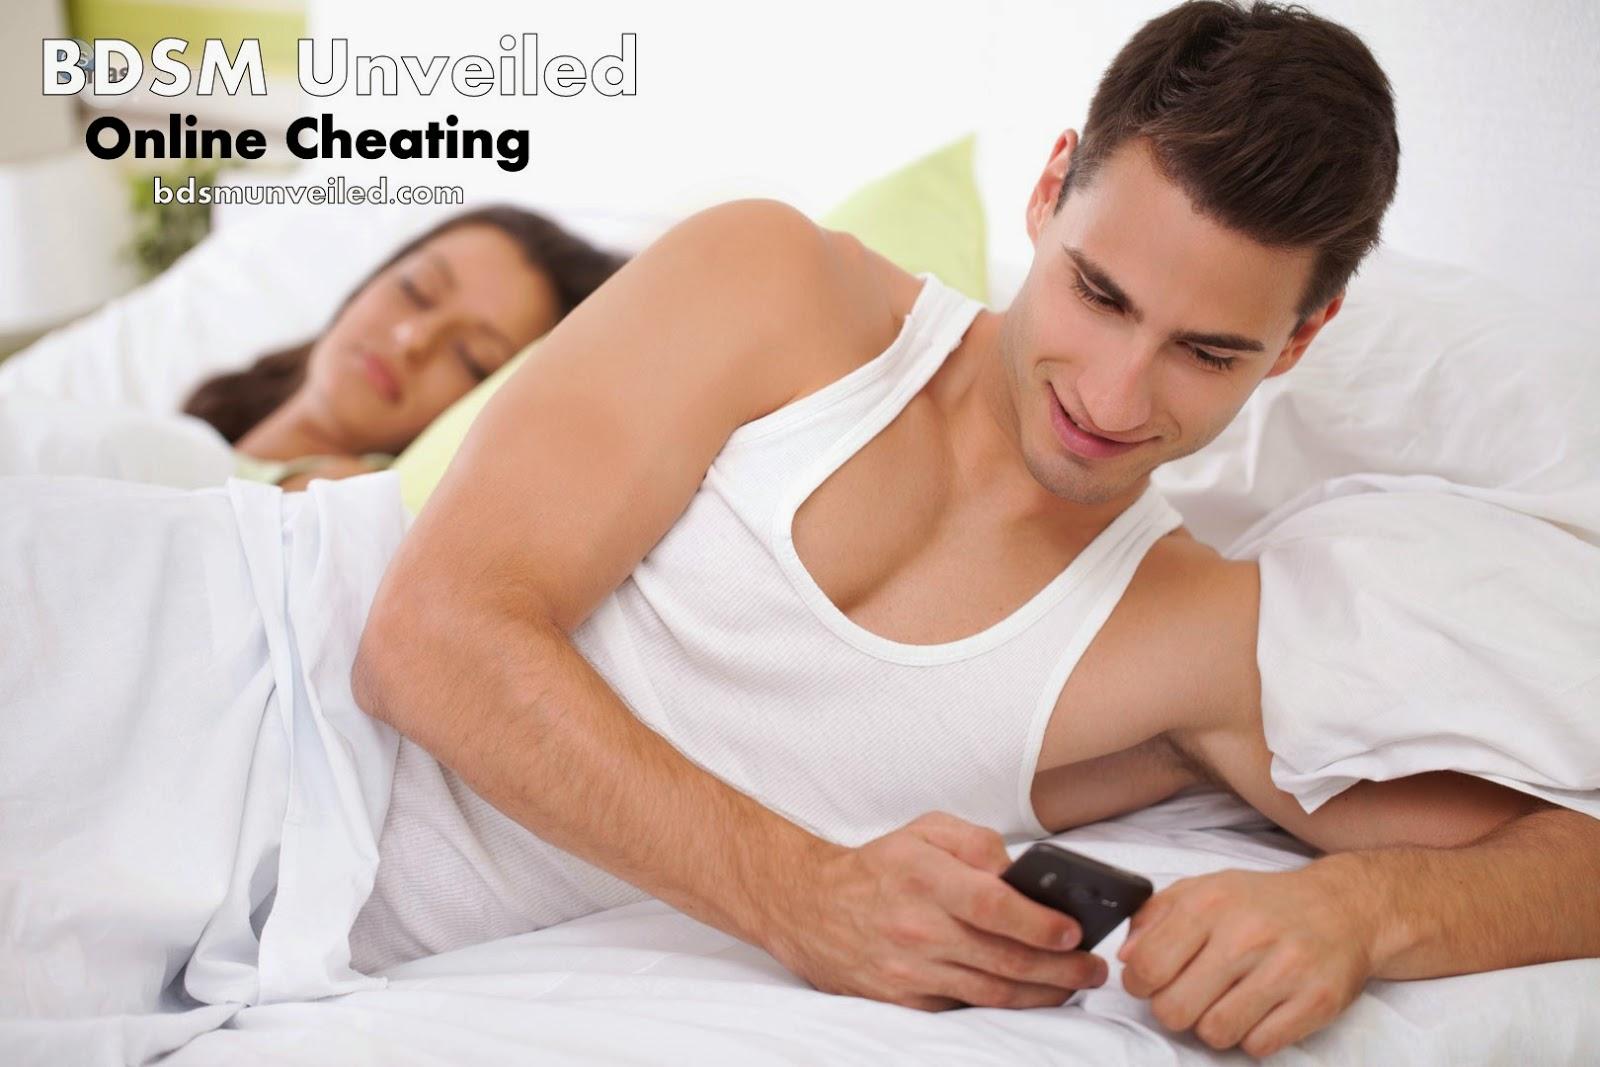 Online Cheating - BDSM Relationships